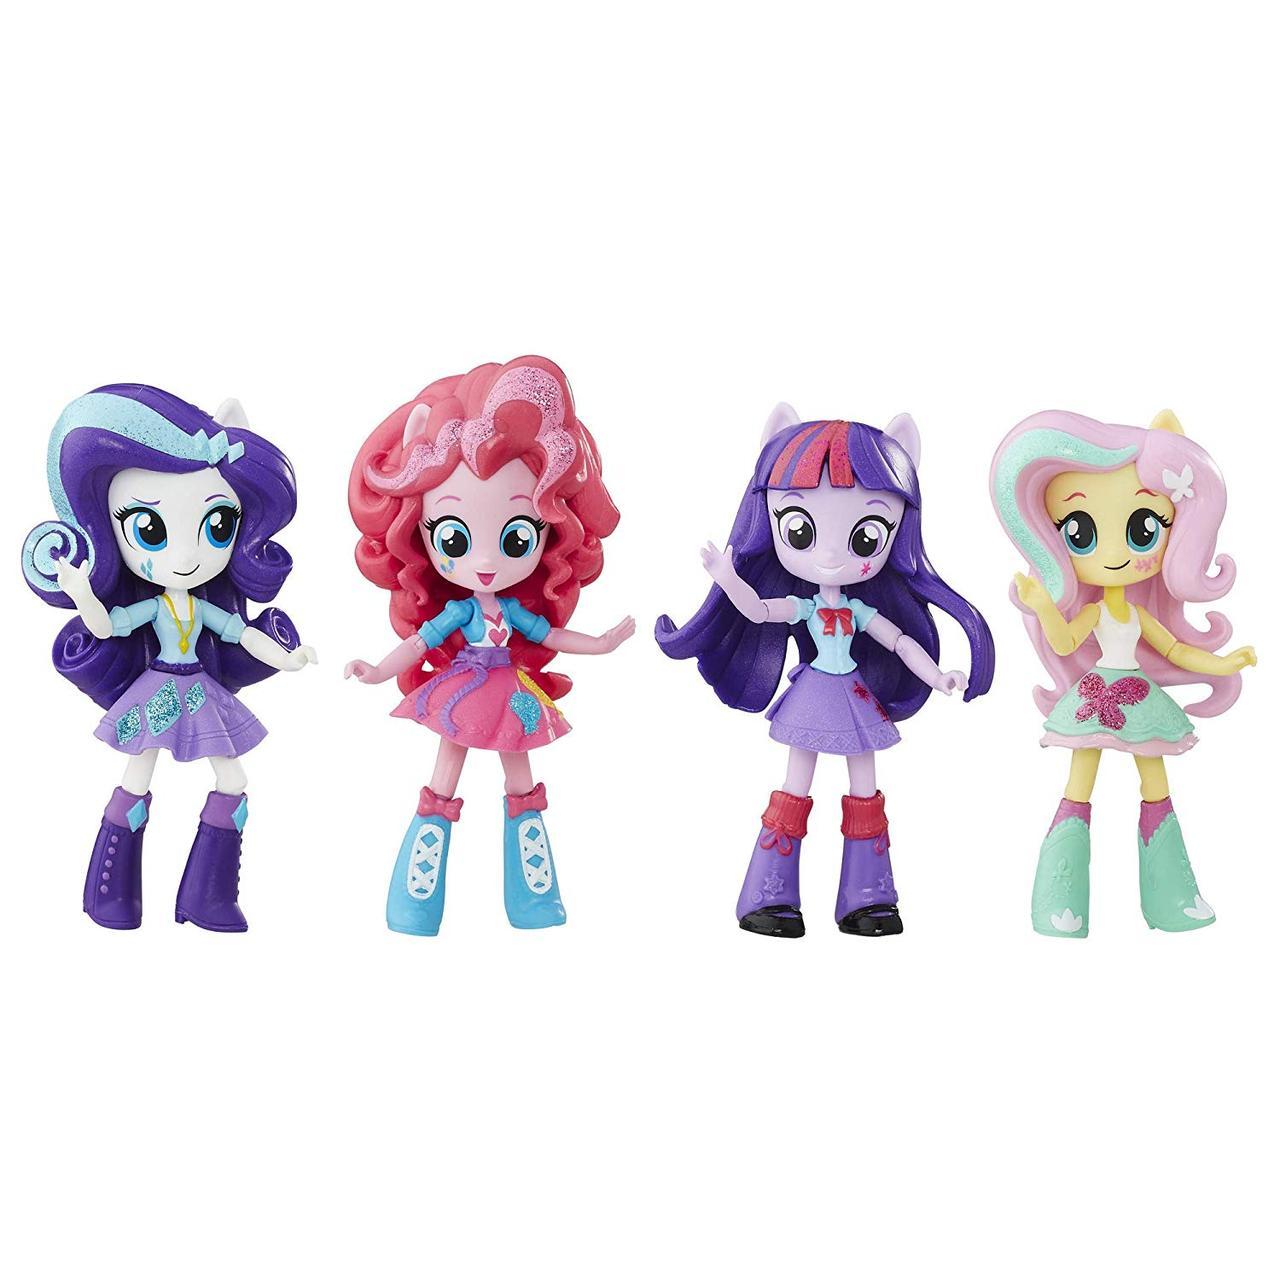 Куклы Май Литл Пони Глитерные Твайлайт Спаркл, Рарити, Пинки Пай, Флаттершай My Little Pony